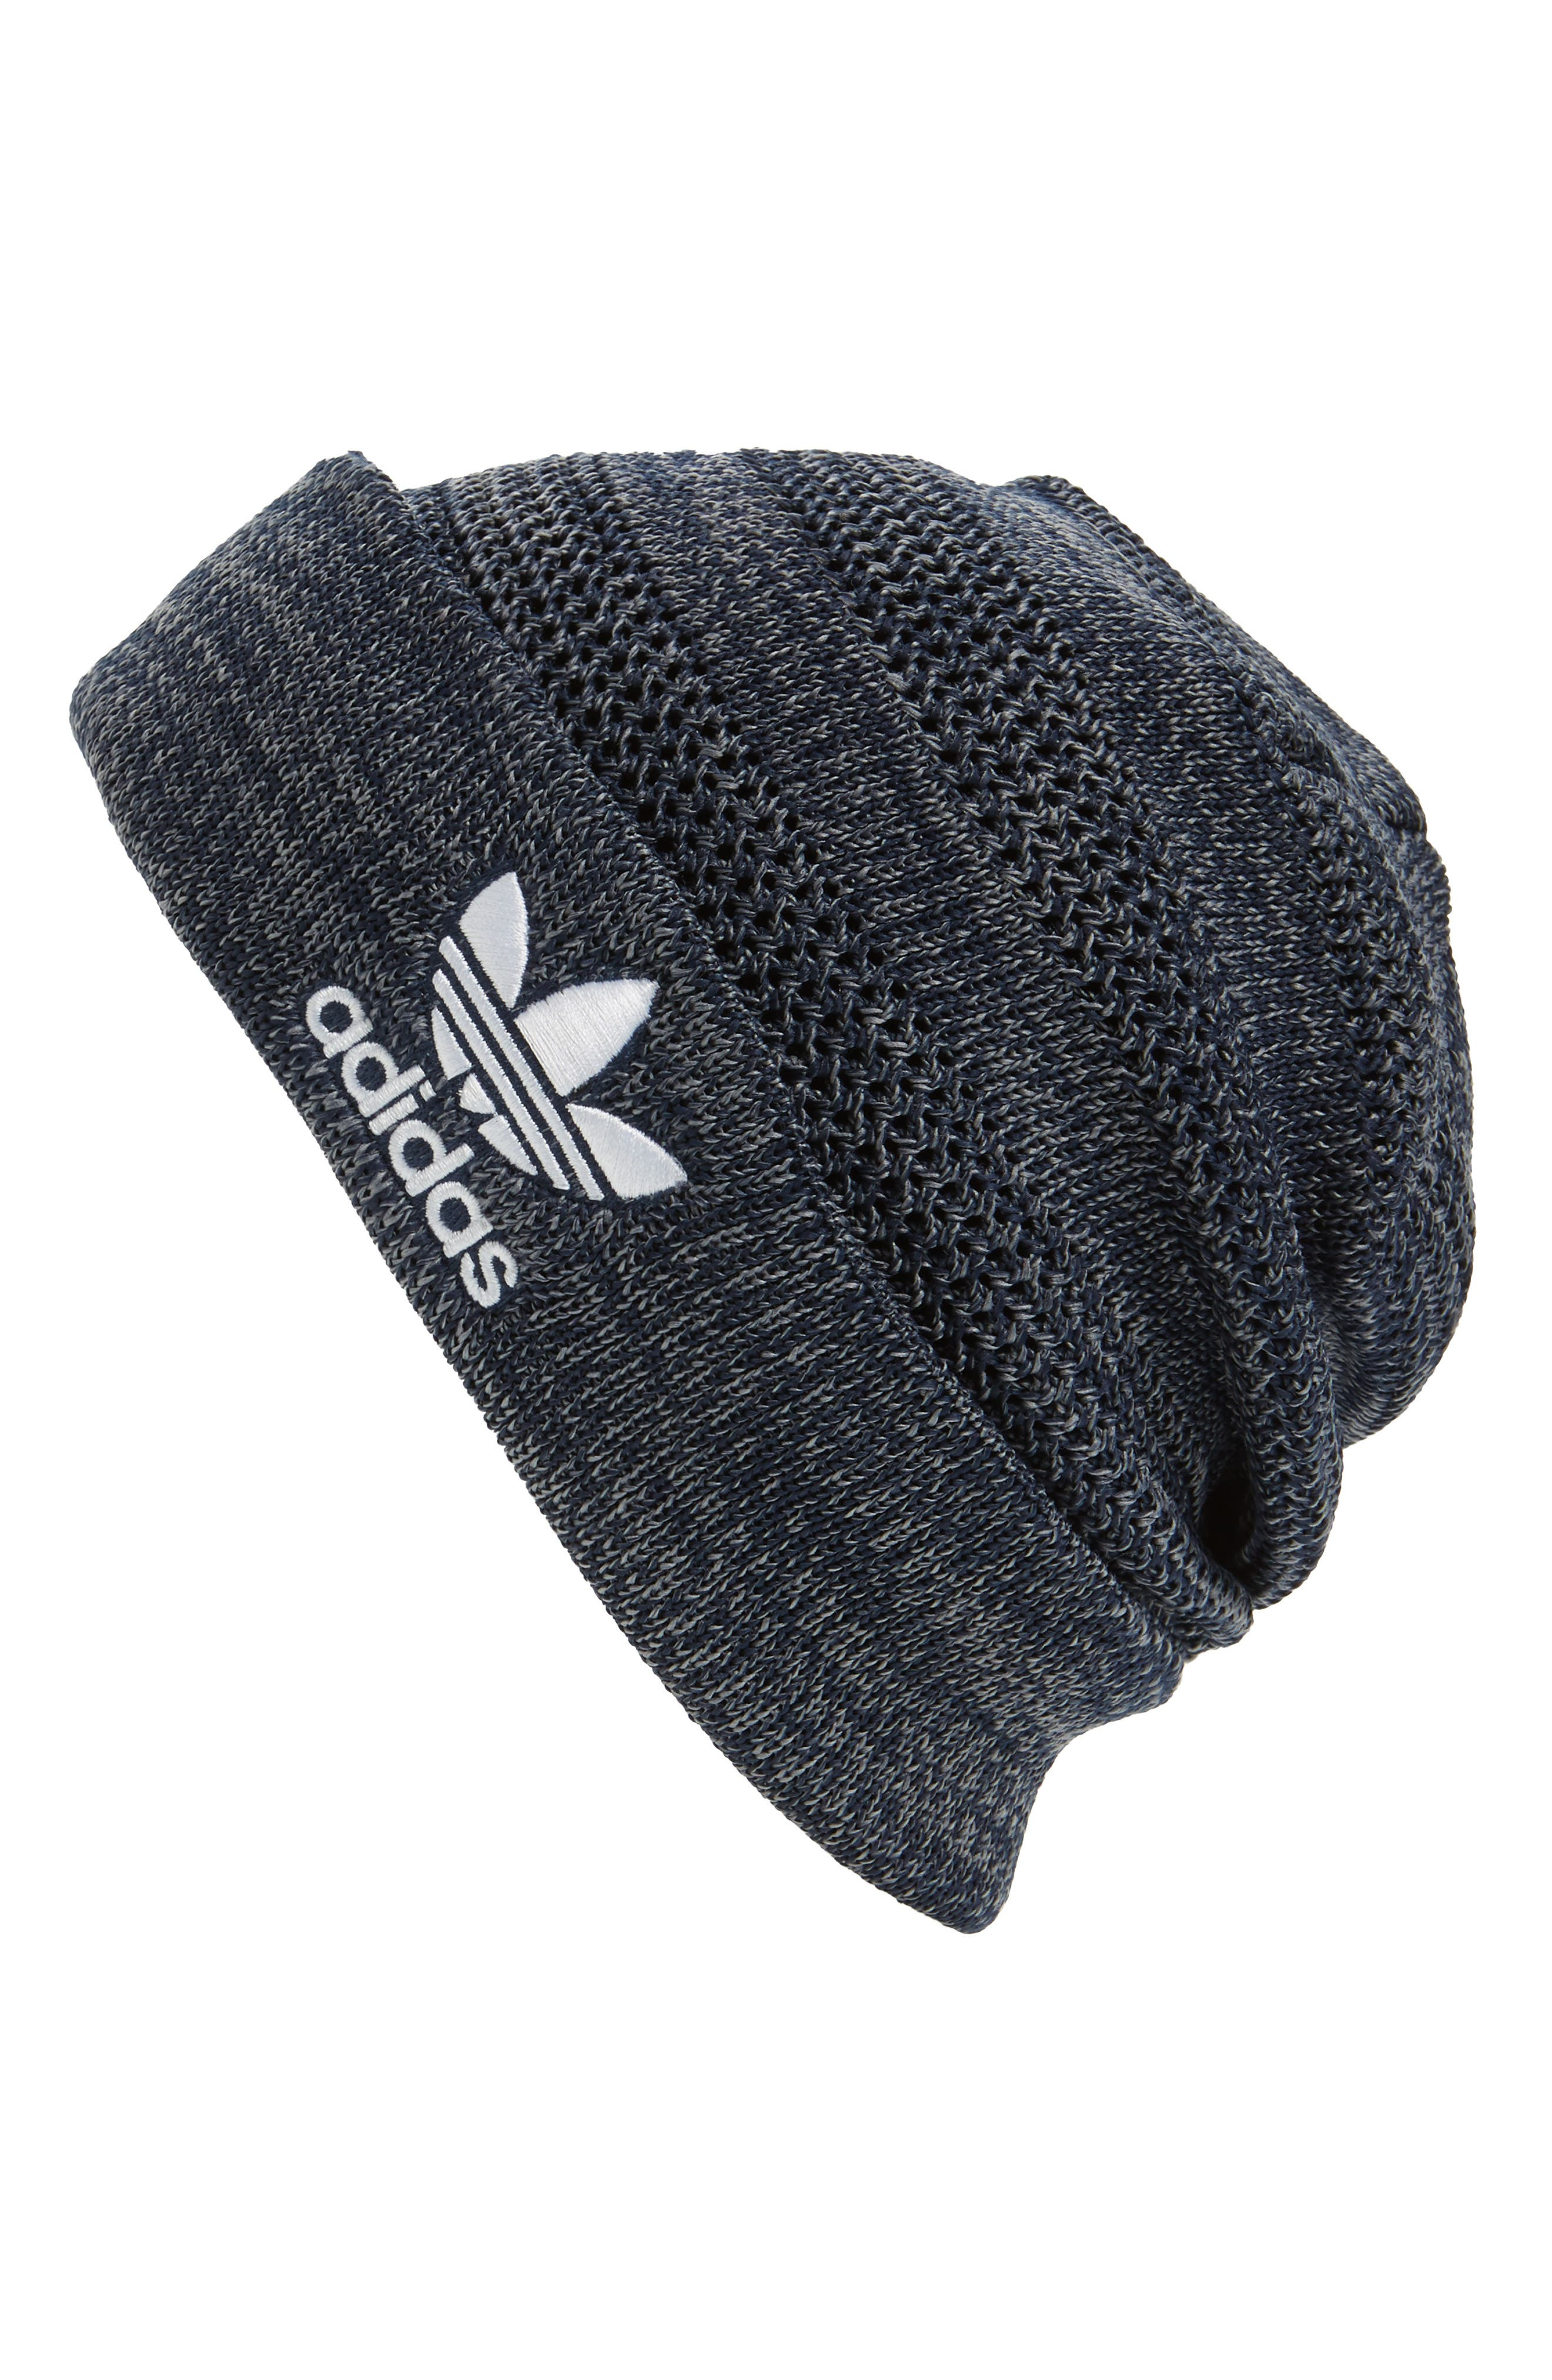 Main Image - adidas Originals Knit Beanie